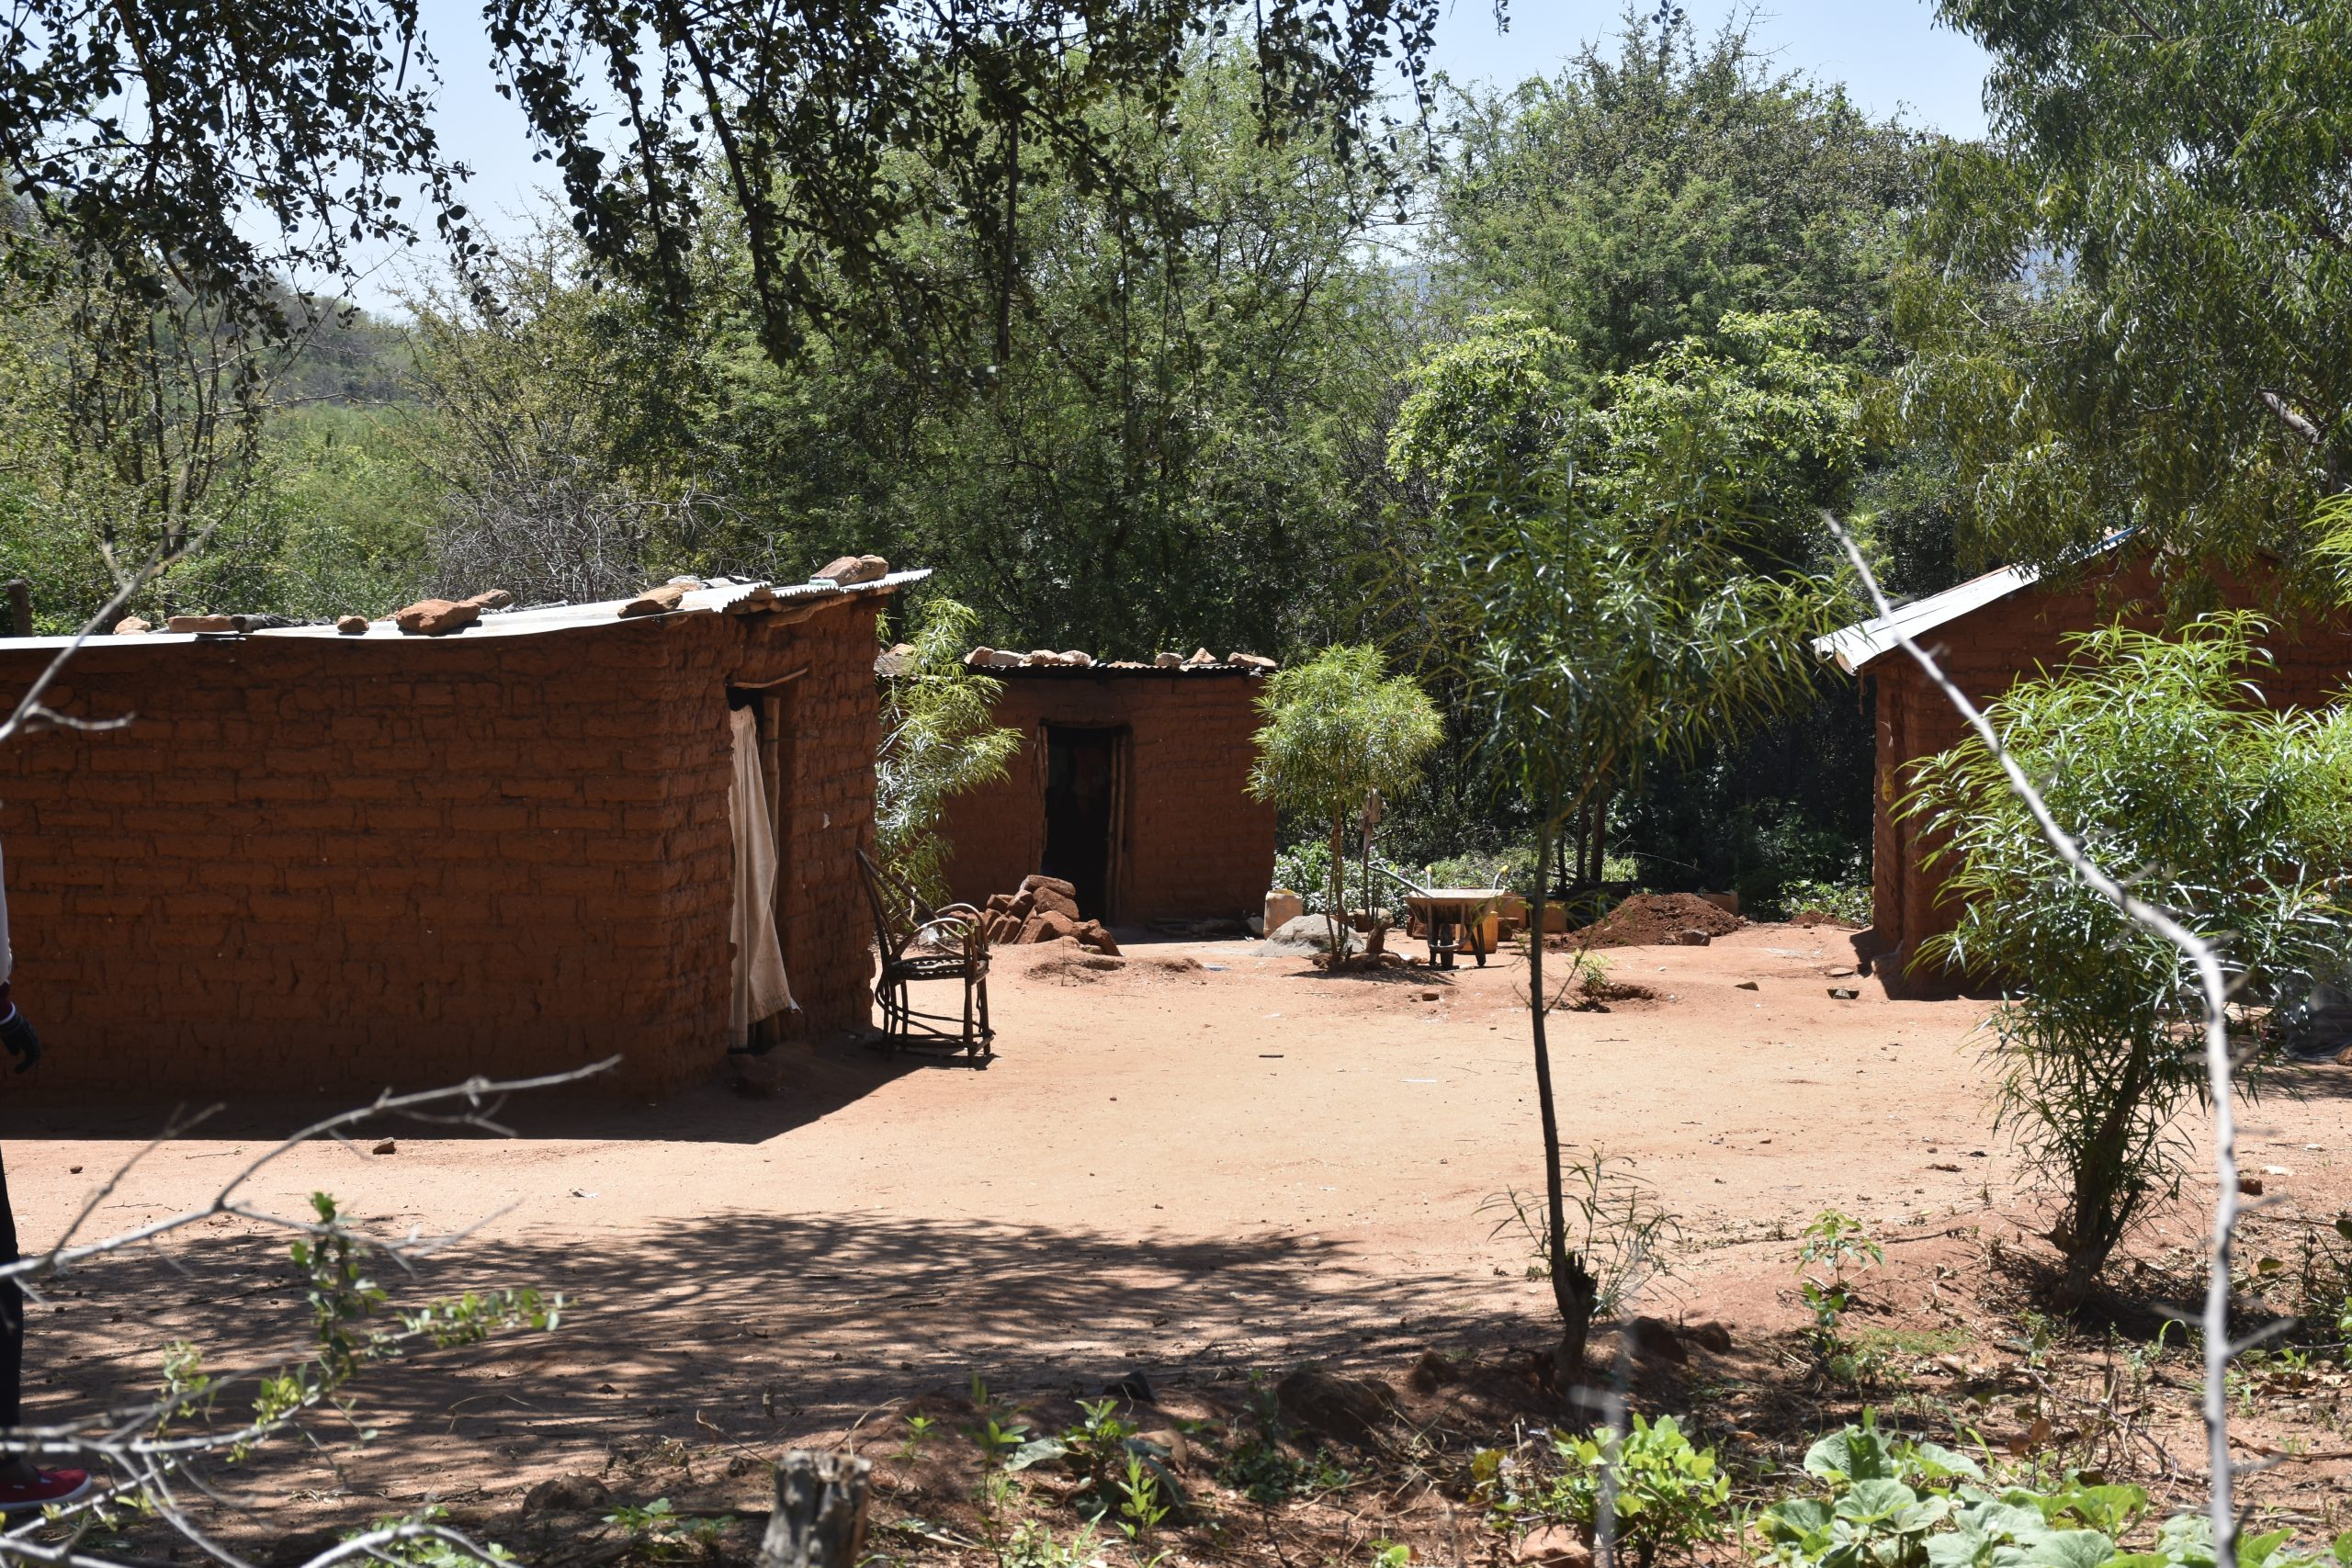 Reuben Musumbi's homestead in Ivinga-Nzia, Kitui county. www.businesstoday.co.ke